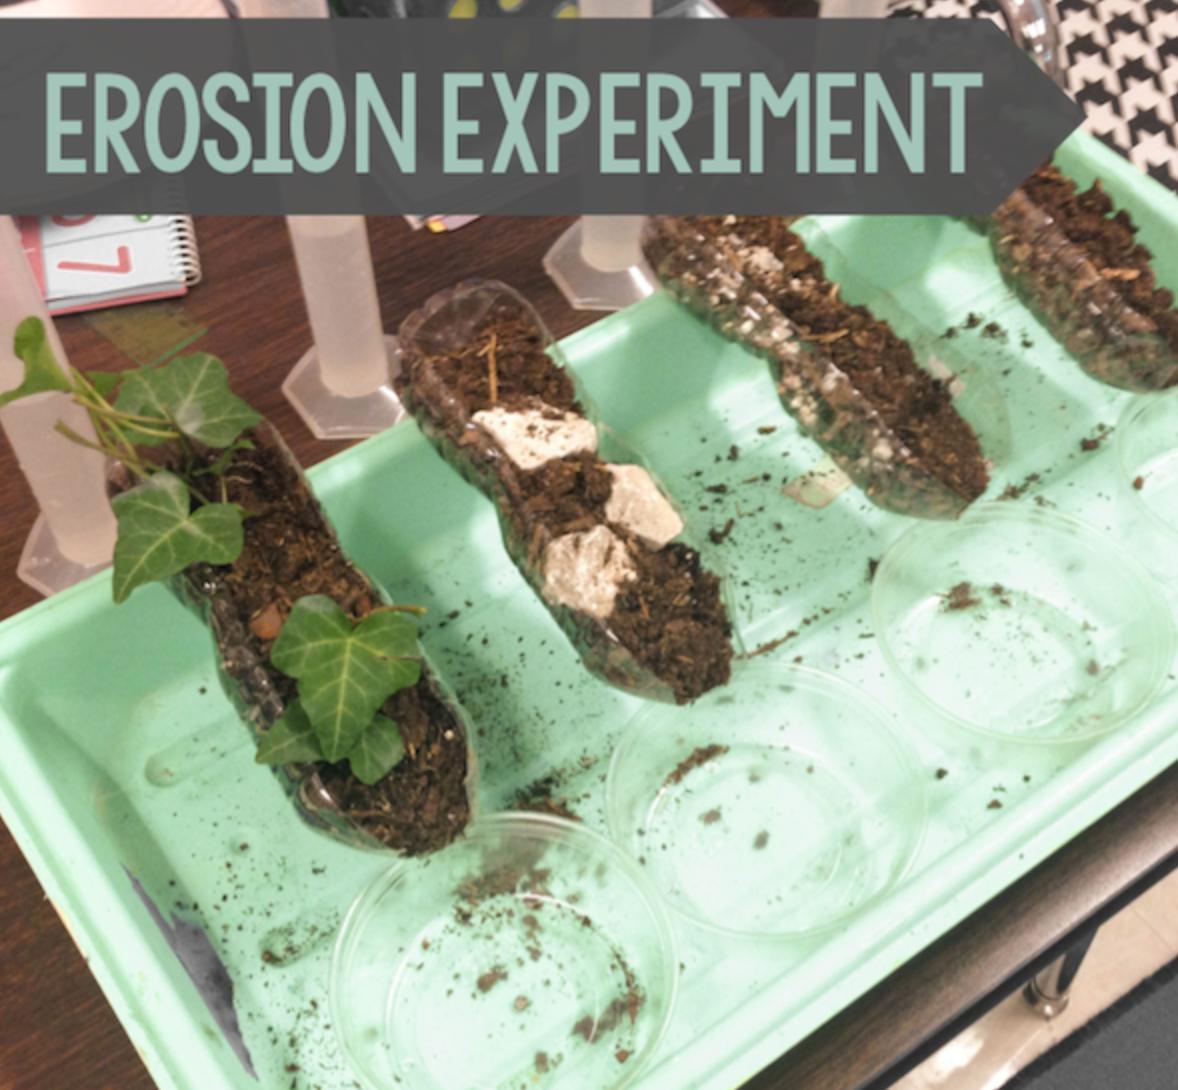 Erosion Experiment In